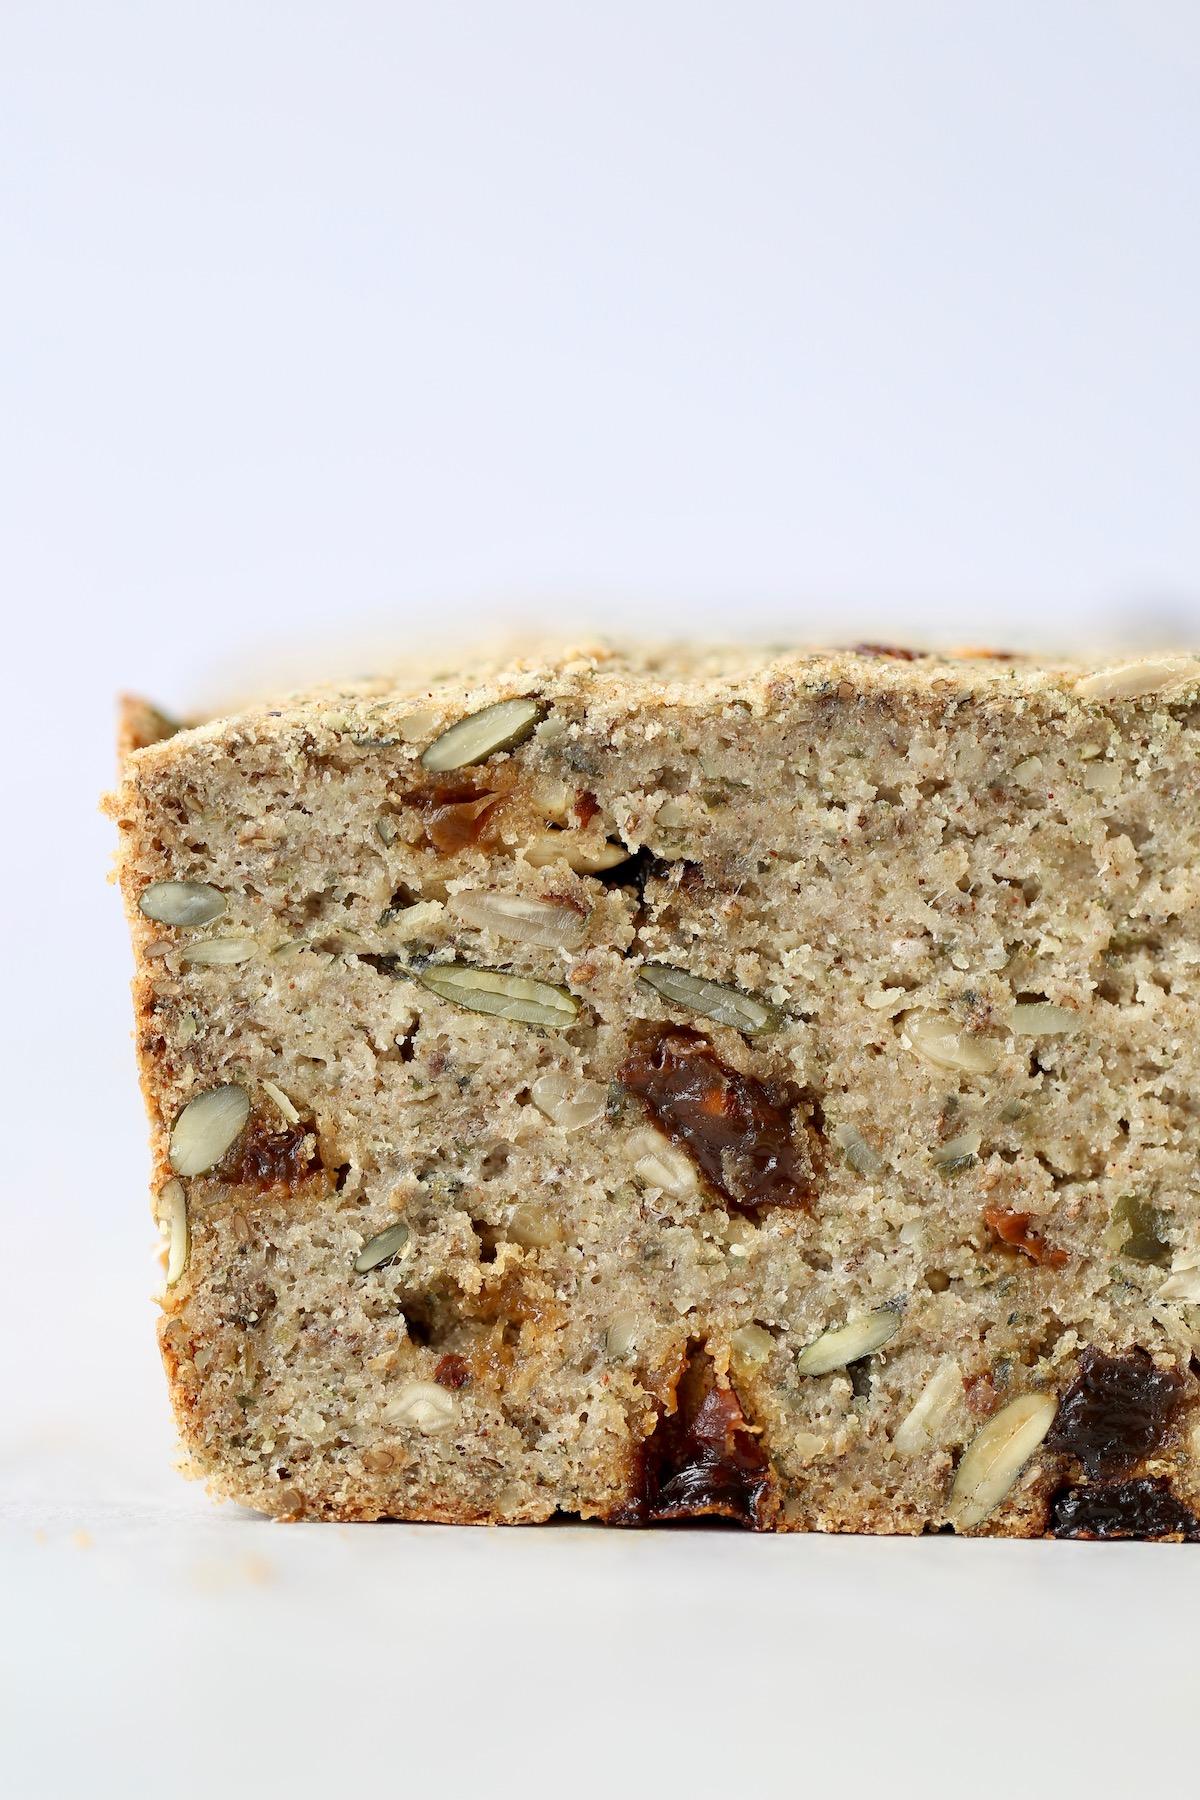 a cross section of gluten-free cinnamon raisin seed bread